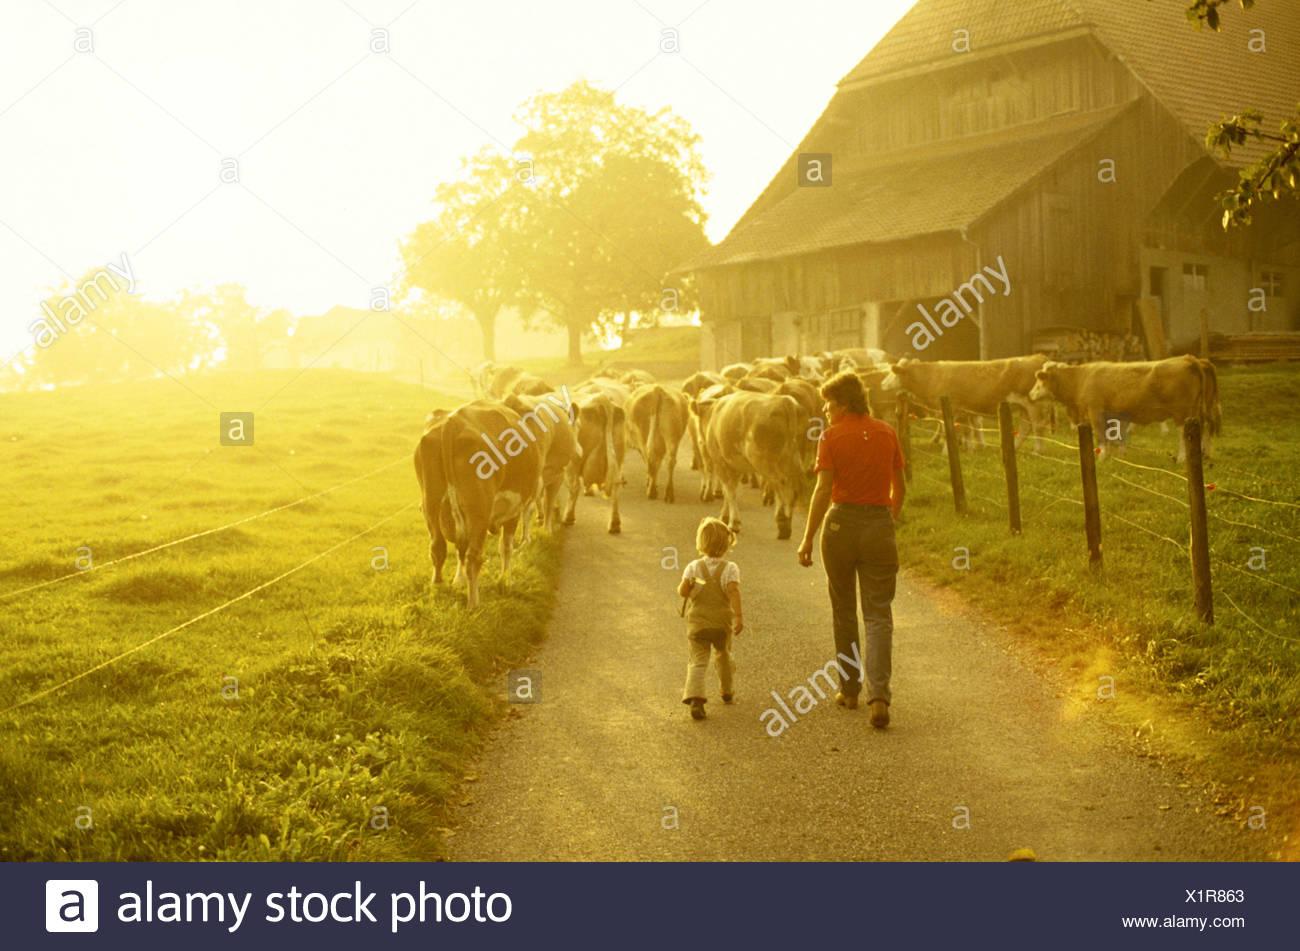 farmer peasant farmers agriculture mood farm back light child cows animals beasts - Stock Image